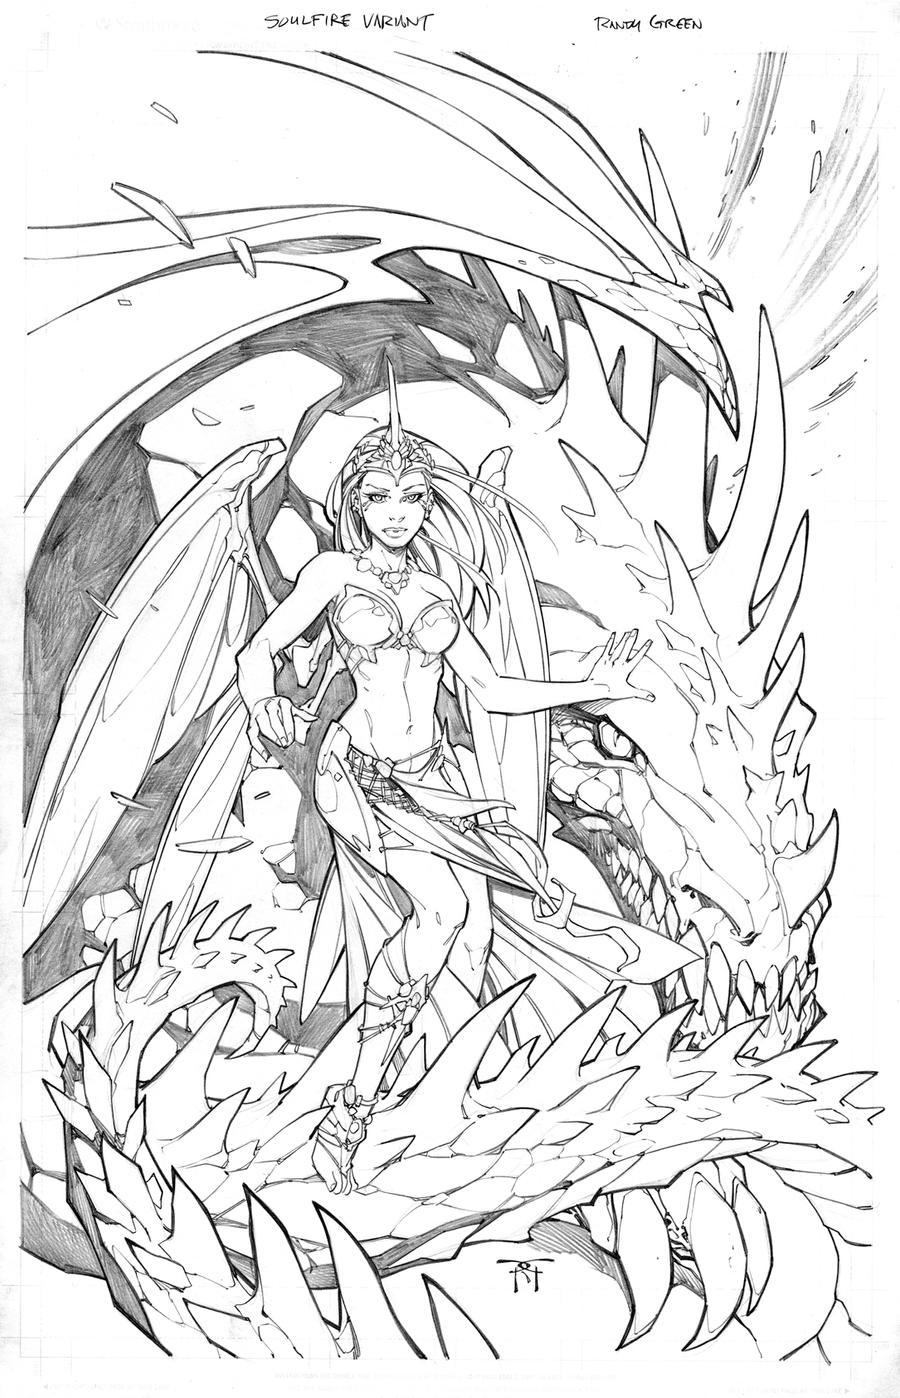 Soulfire Variant by RandyGreen